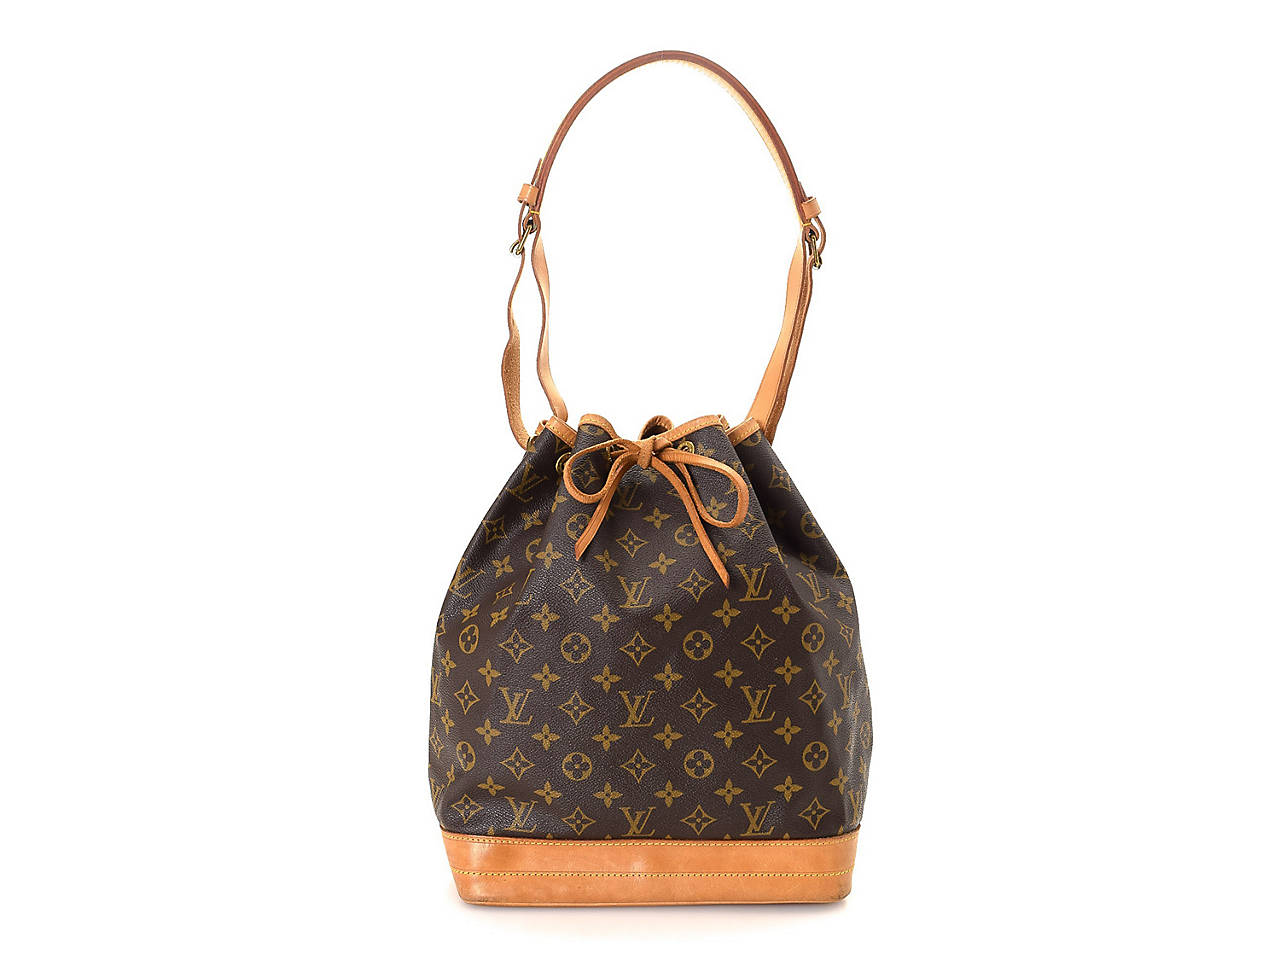 4258ae1d4c1e Louis Vuitton - Vintage Luxury Noe Bucket Bag Women s Handbags ...